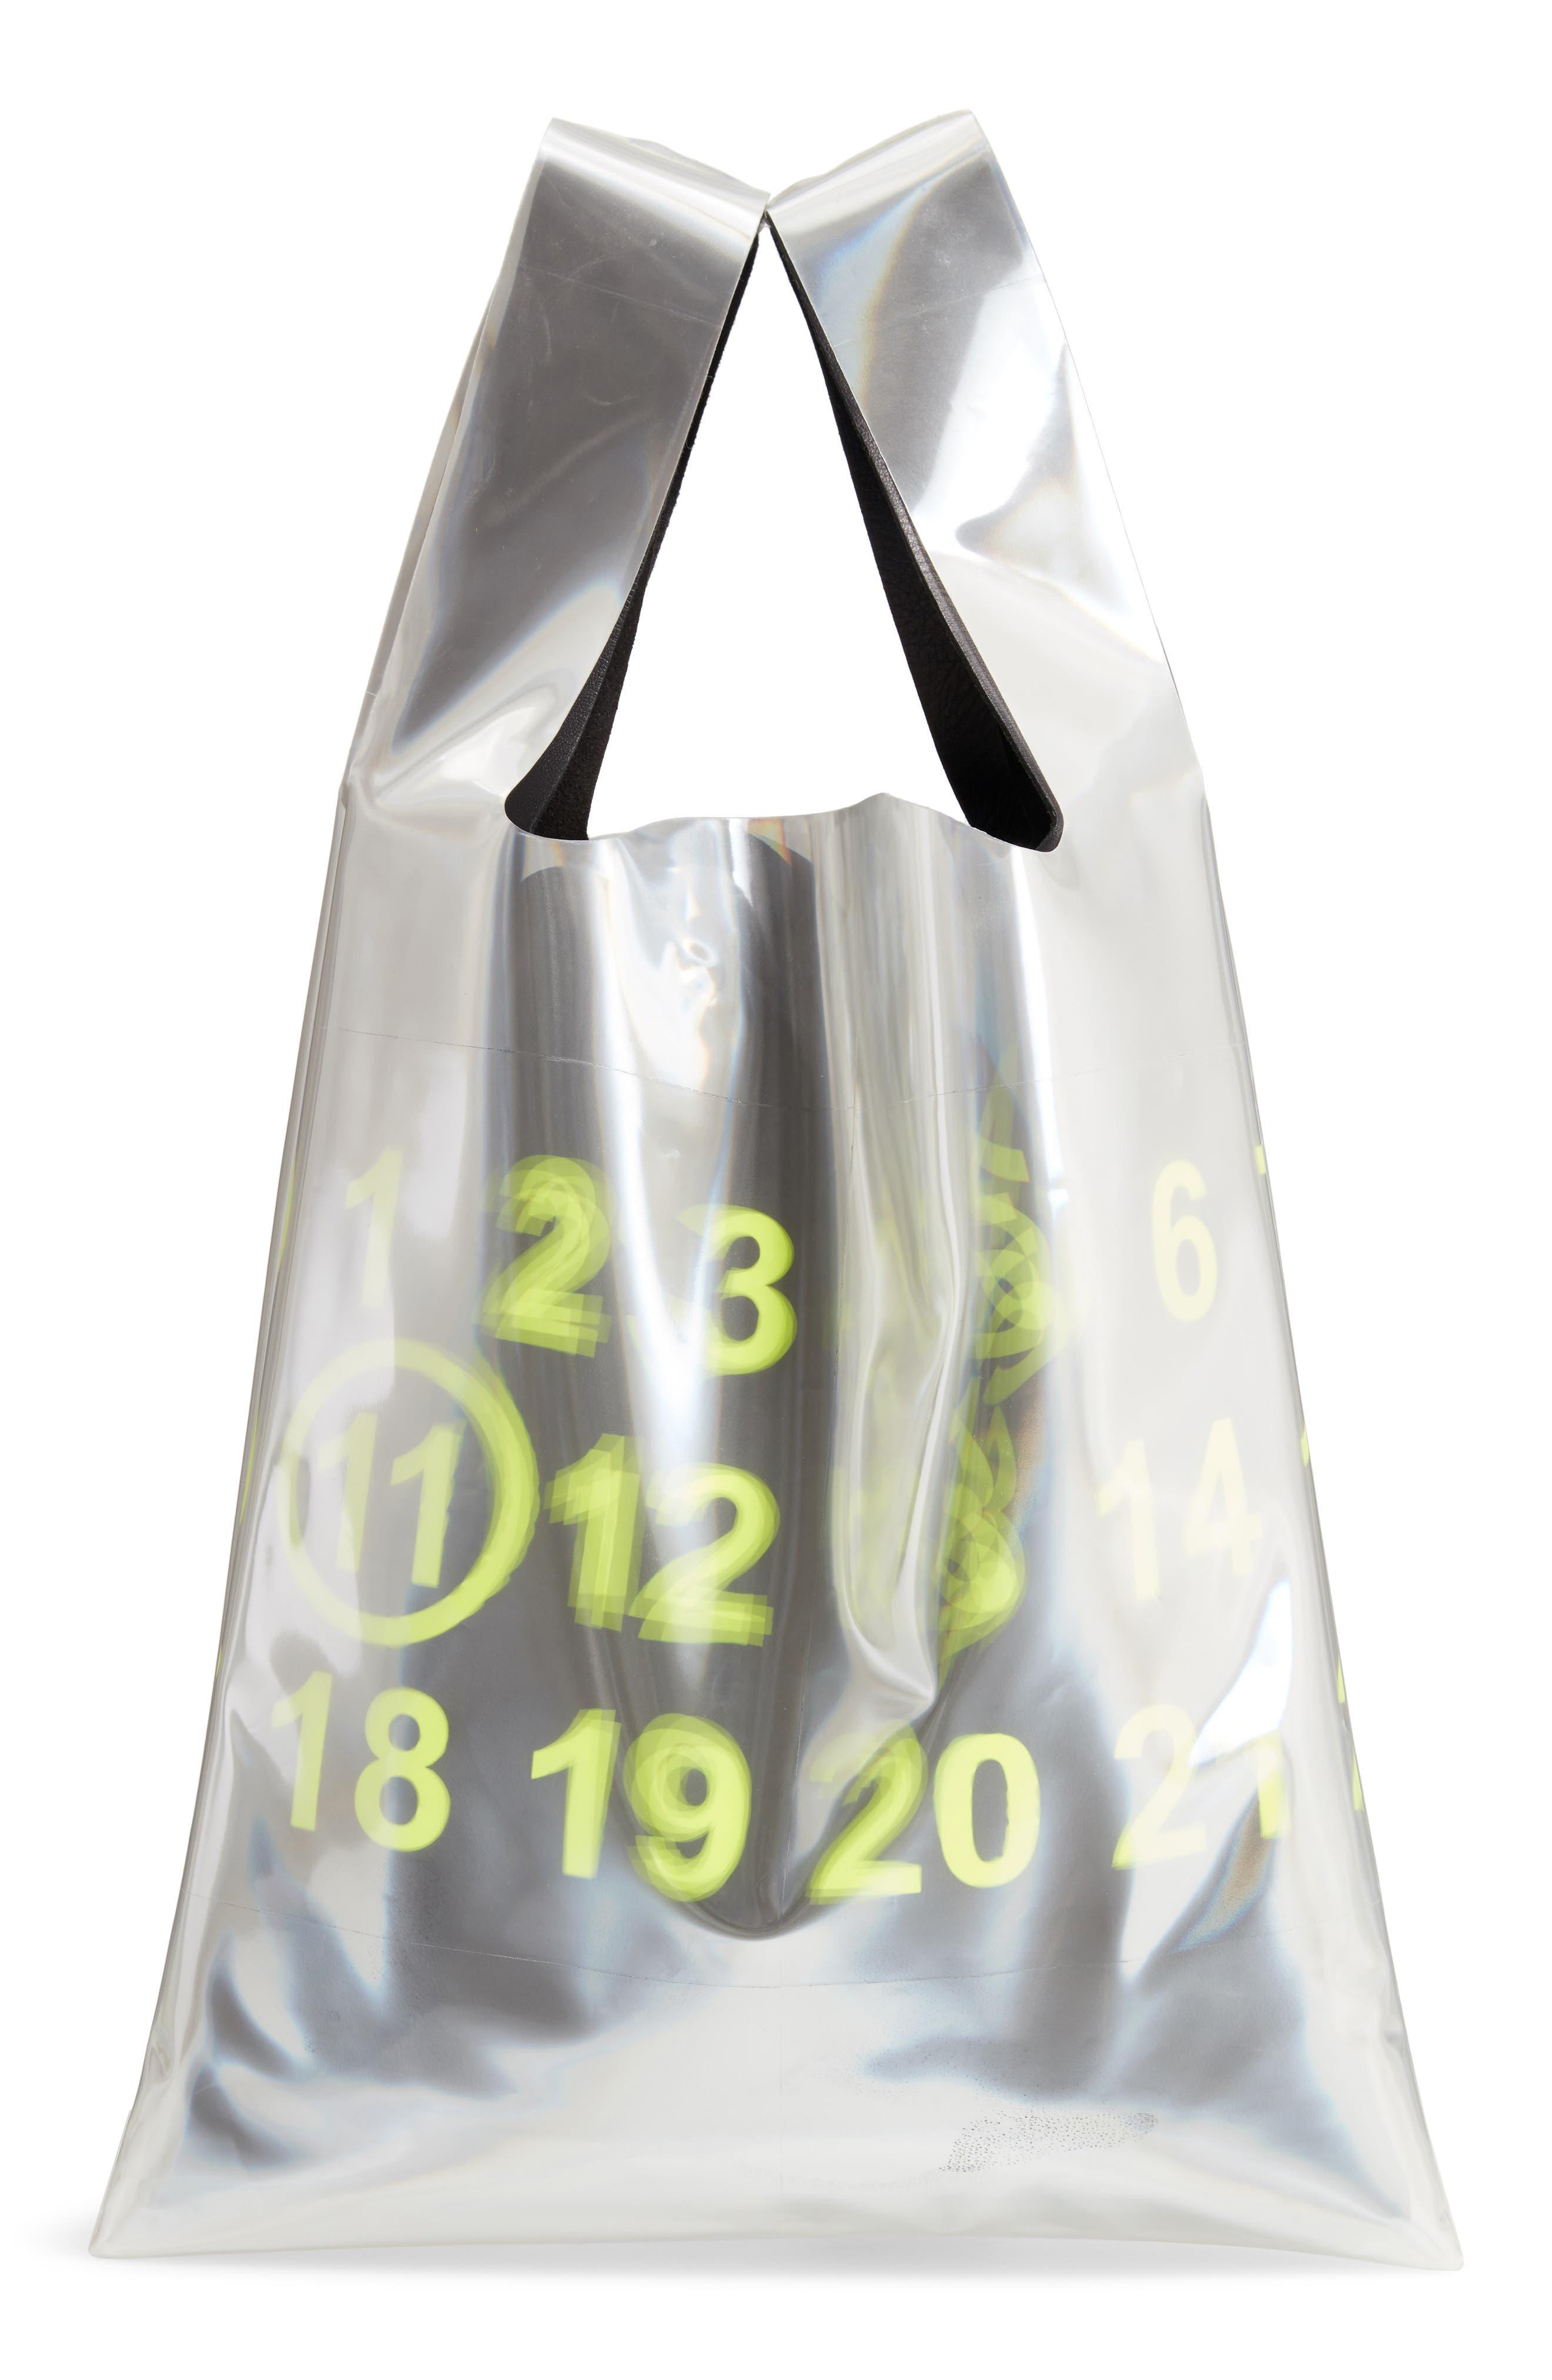 PVC & Leather Shopper Bag,                             Main thumbnail 1, color,                             BLACK/ YELLOW FLUO